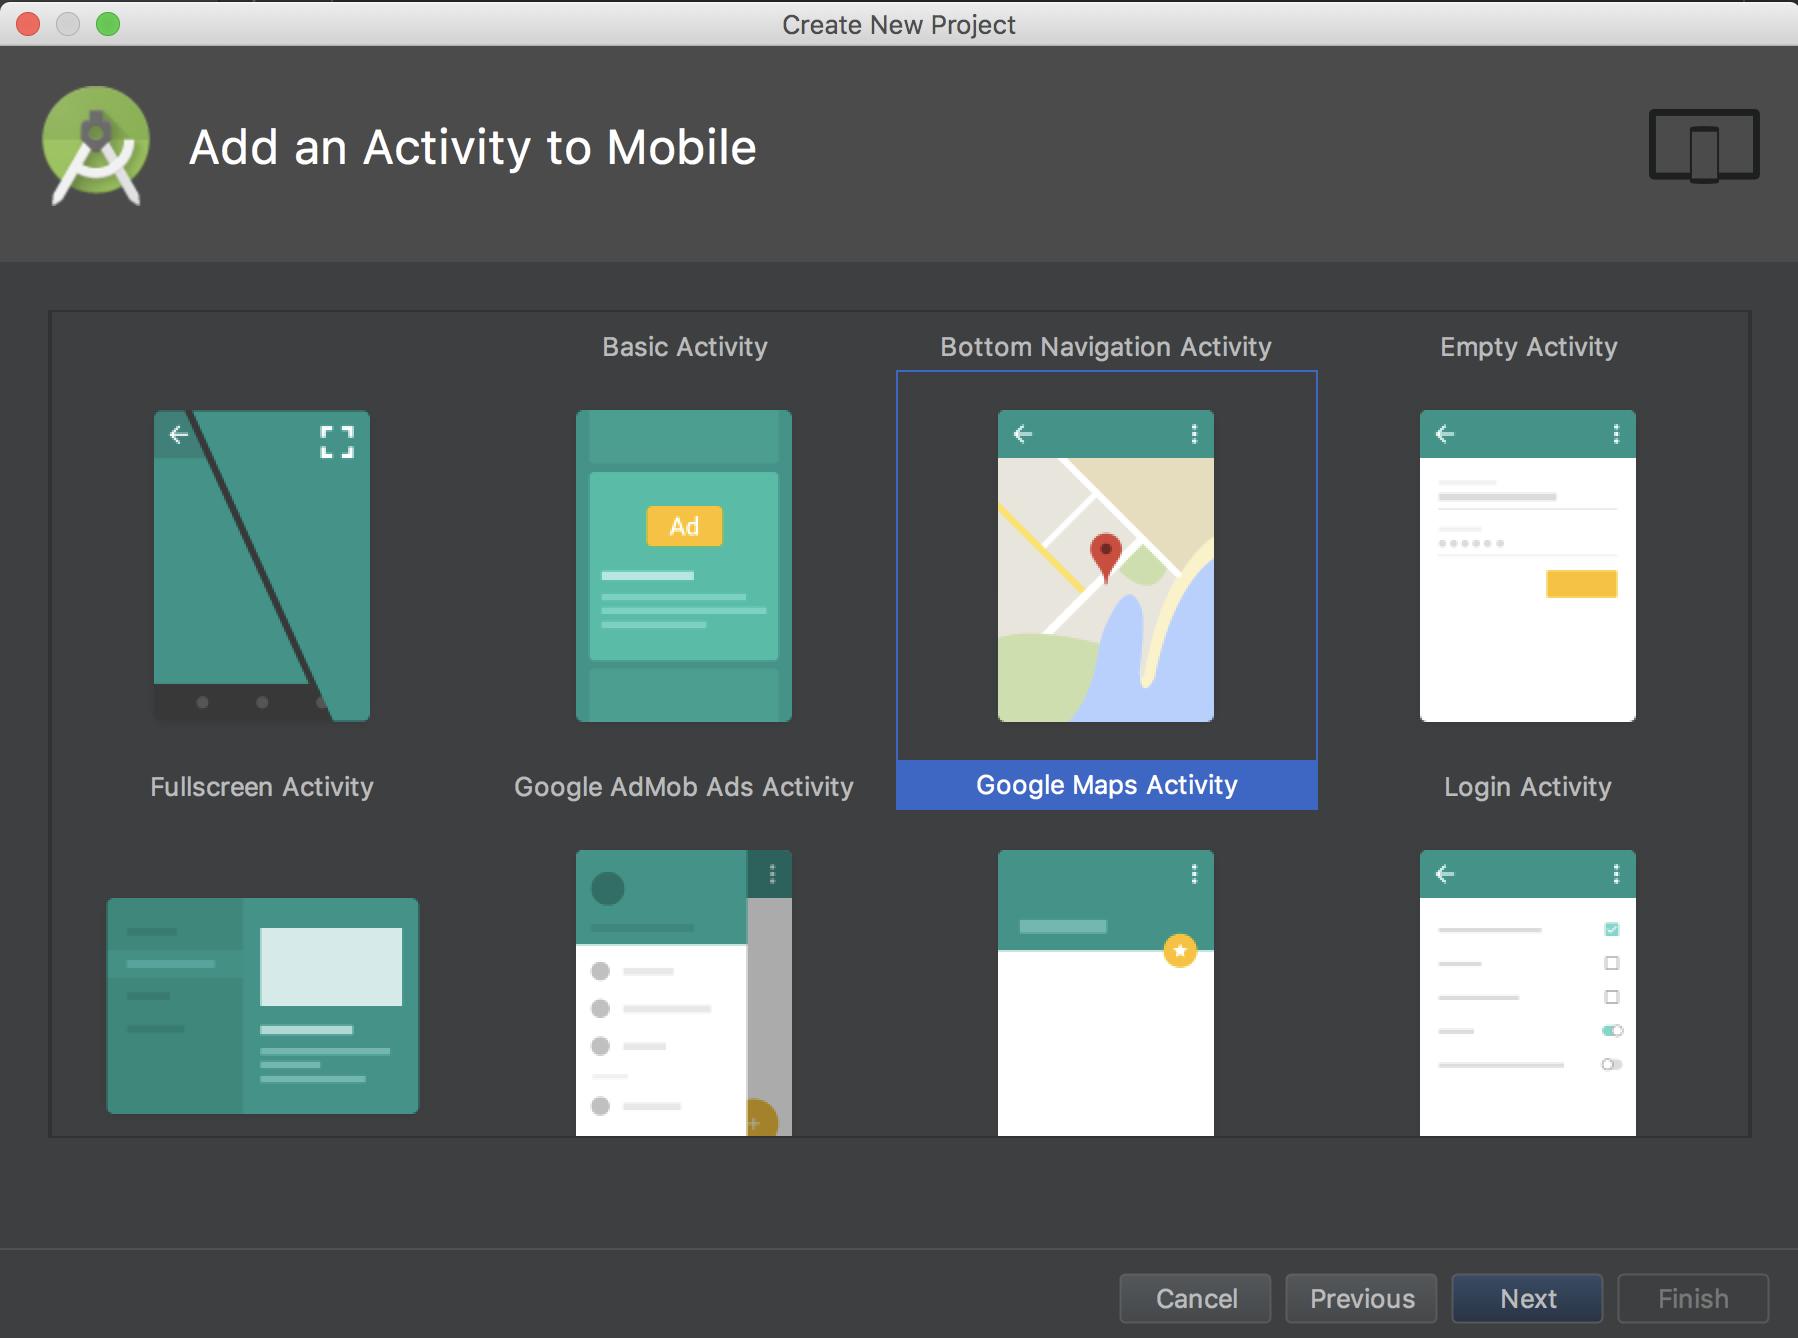 Google Maps Activity を選択